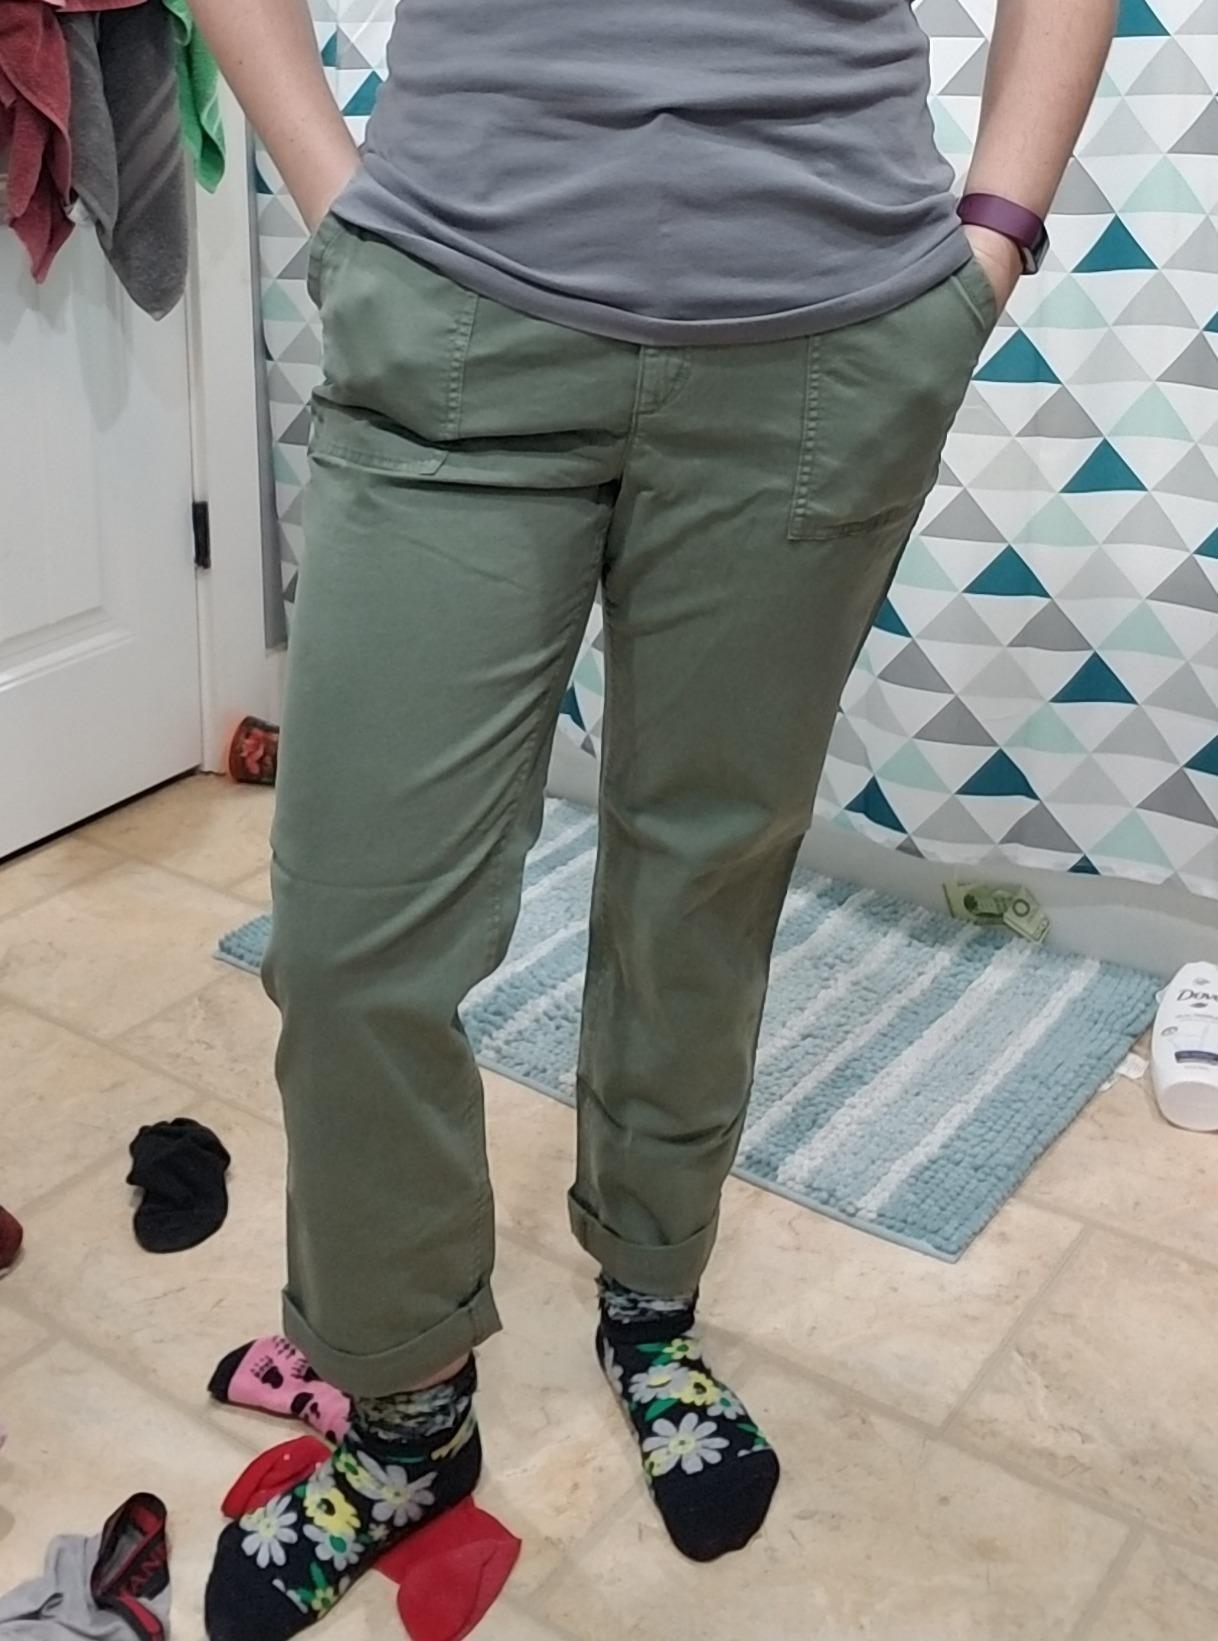 Reviewer wearing green chino pants